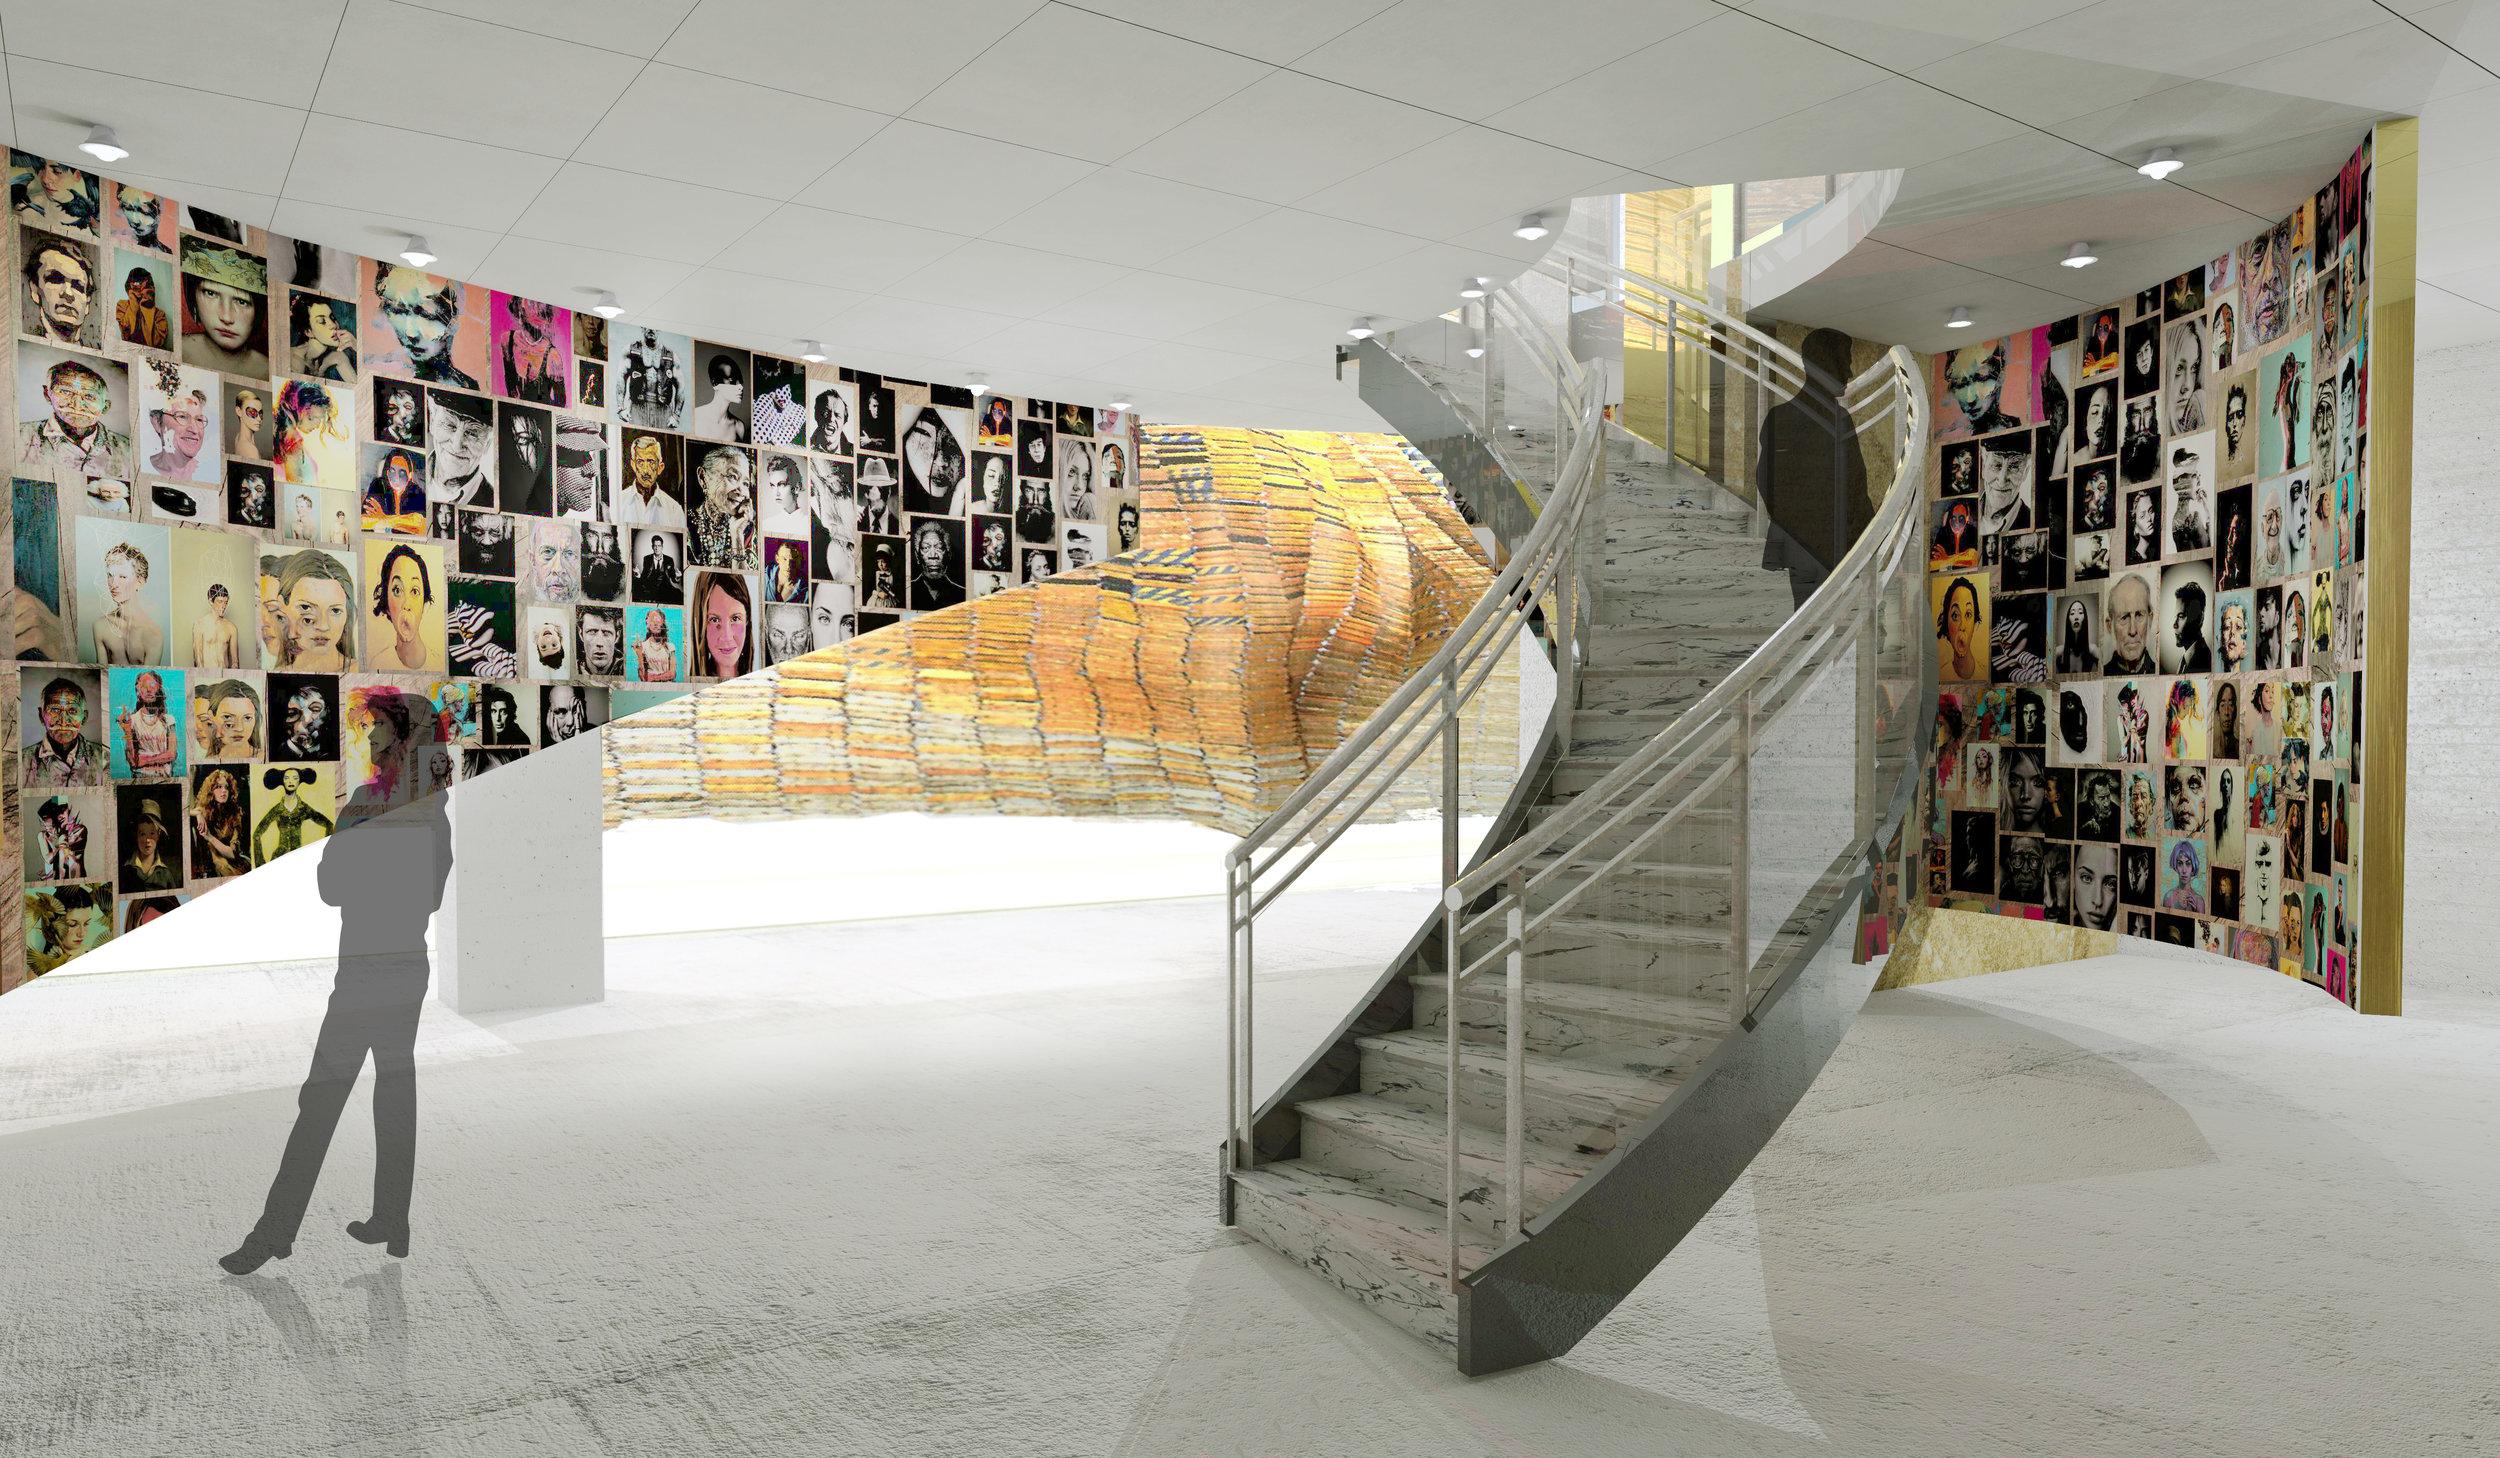 yen-min-lin-perle-casse-gallery--art-therapy-center-mfa-1_17386524868_o.jpg